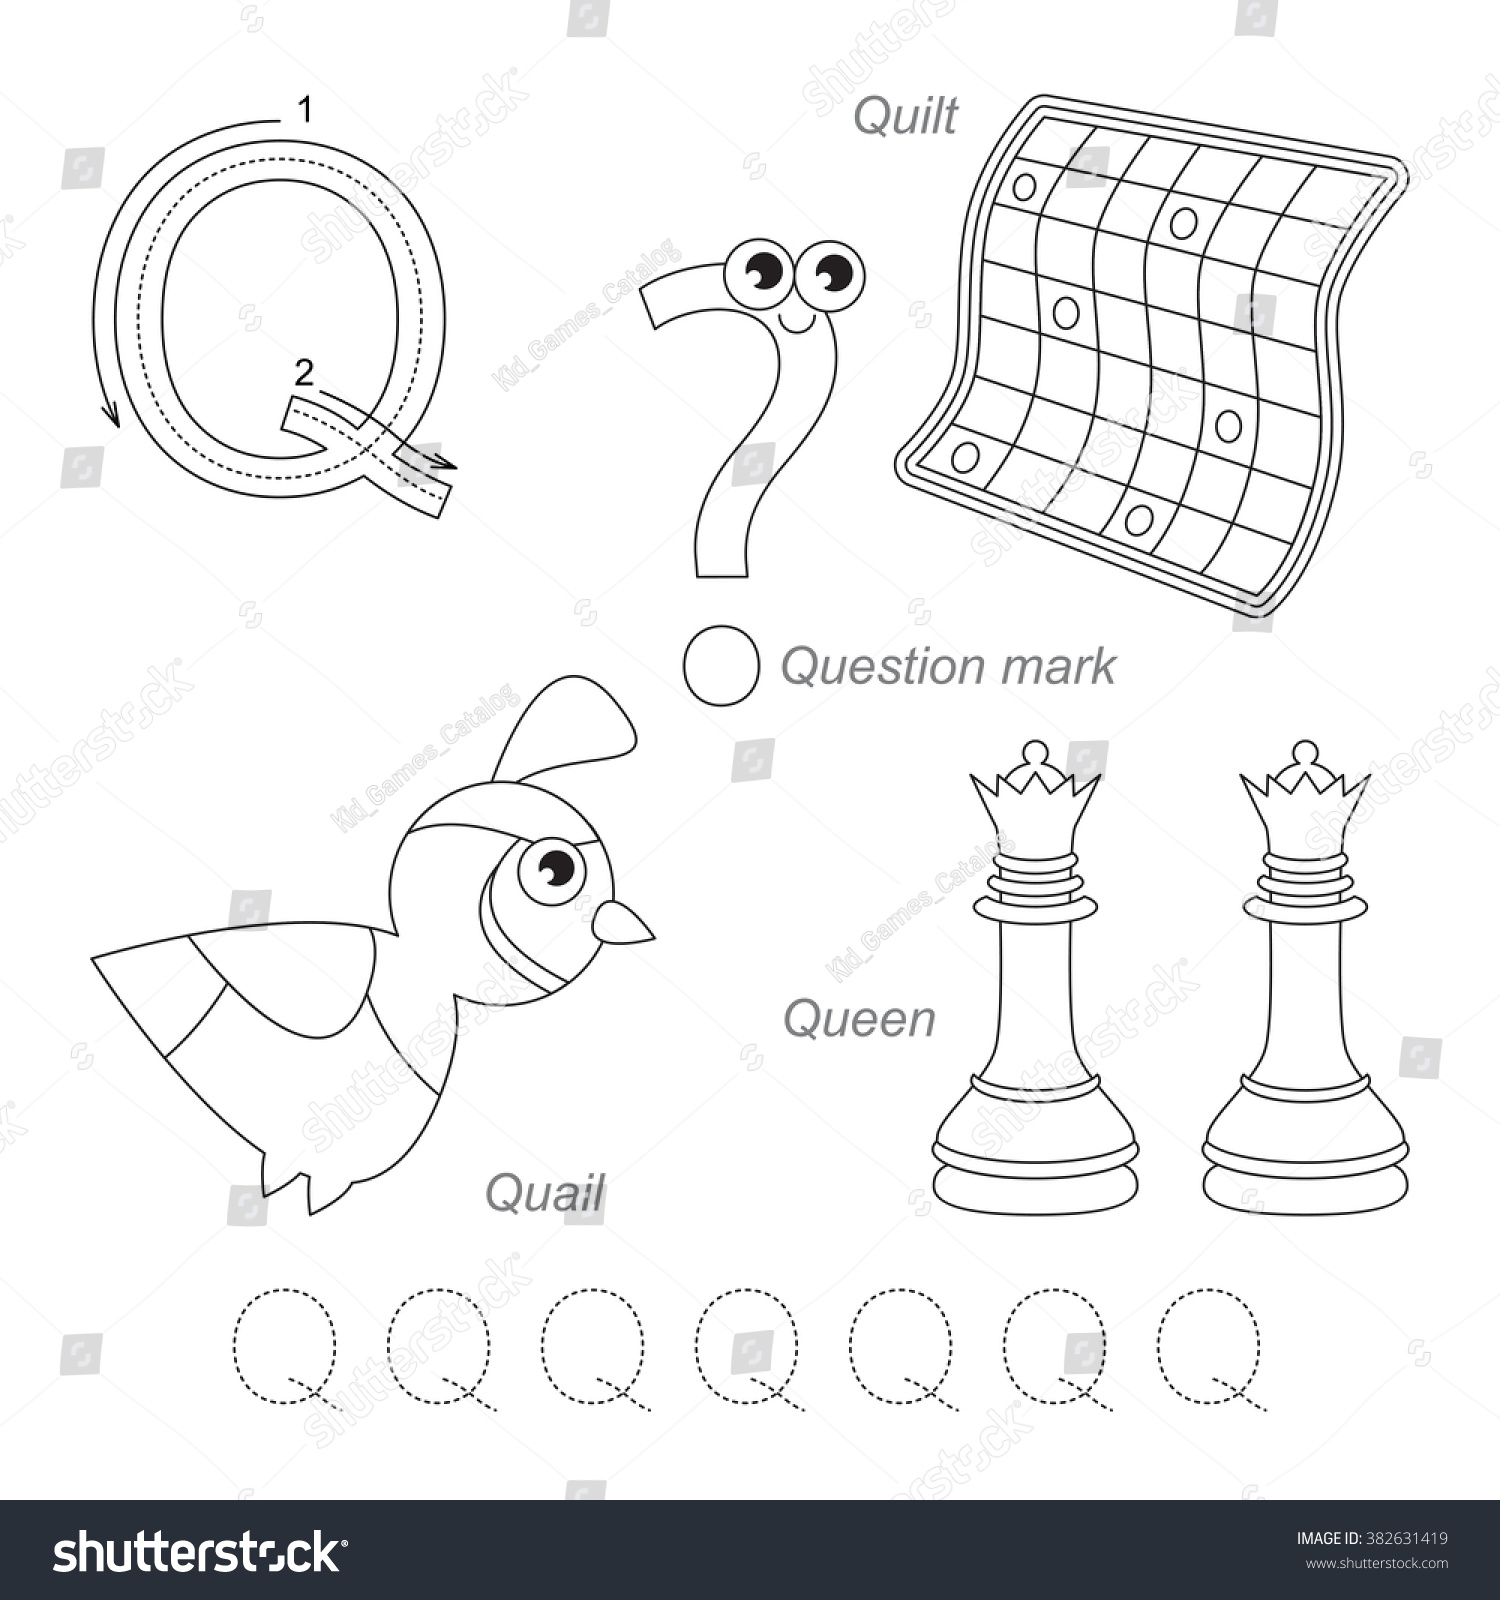 Tracing Worksheet Children Full English Alphabet Stock